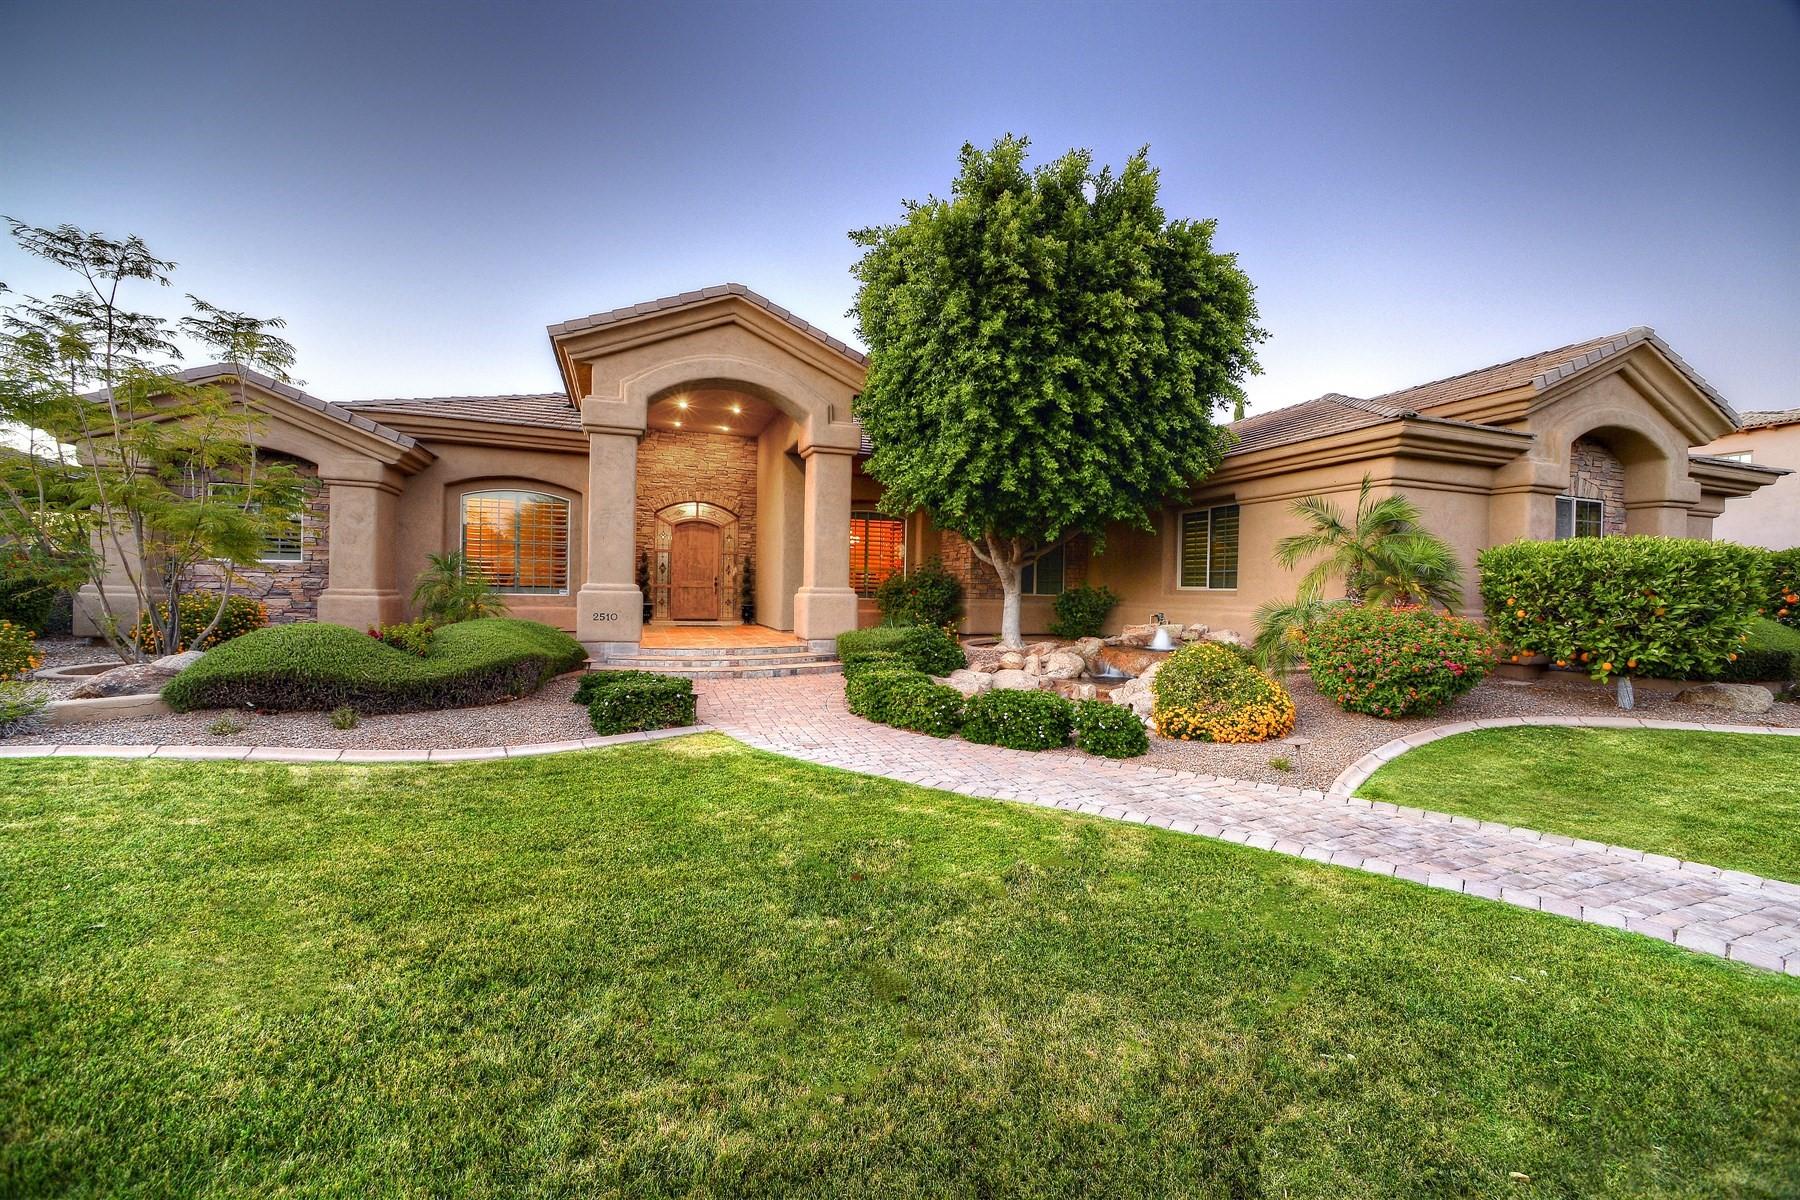 Vivienda unifamiliar por un Venta en Outstanding custom home in the prestigious enclave of Glenwood Parke 2510 E Minton St Mesa, Arizona, 85213 Estados Unidos